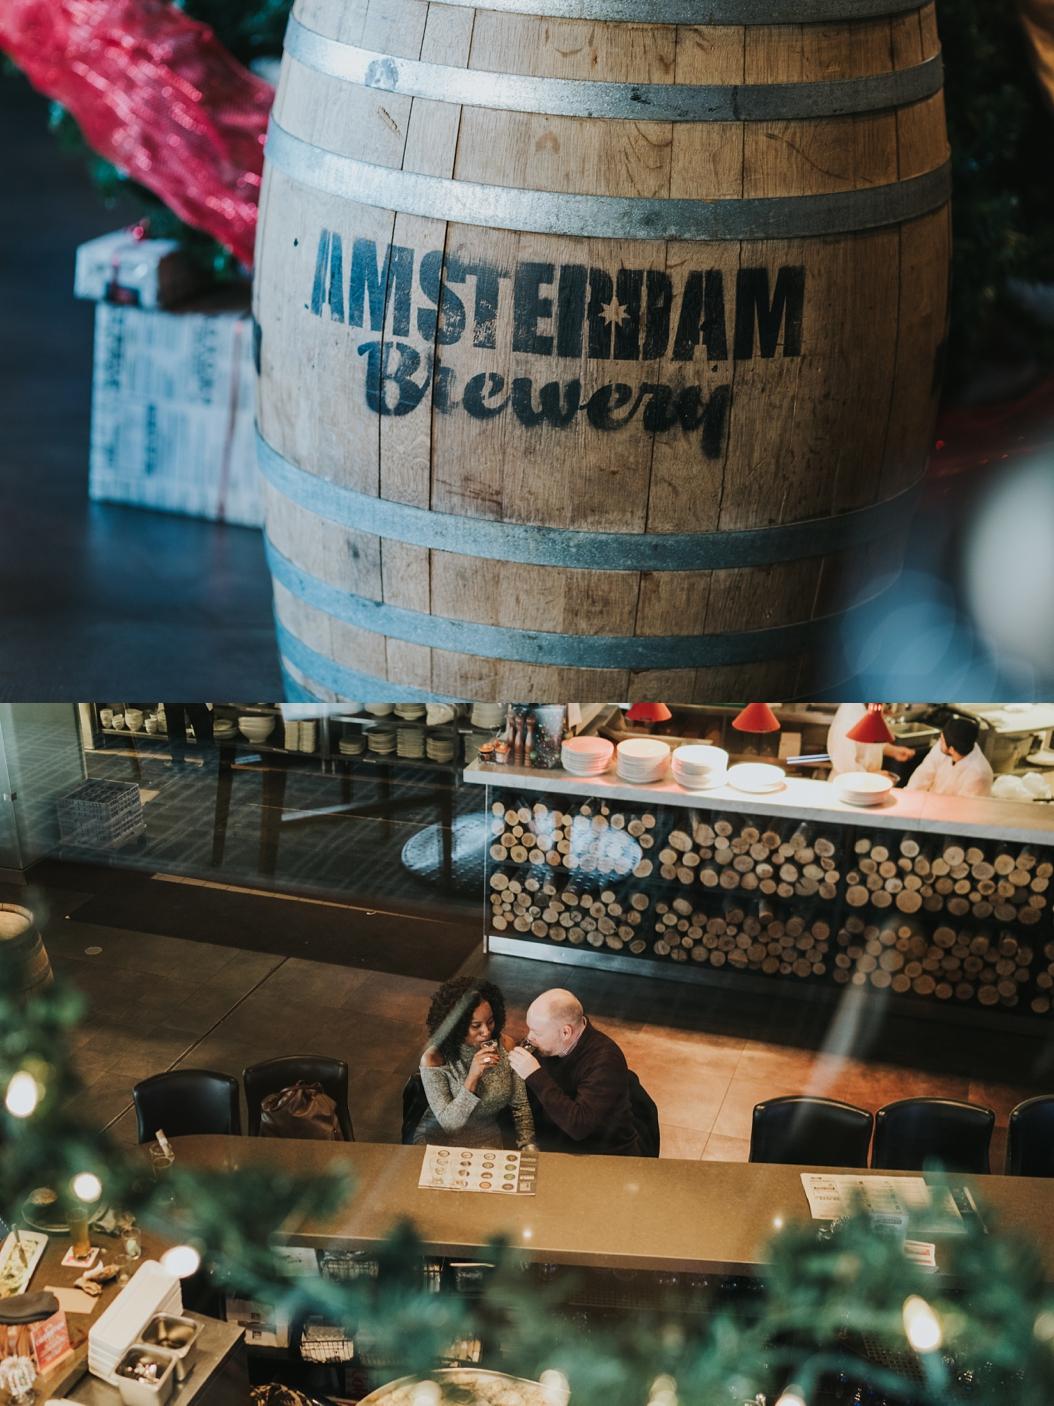 Amsterdam Brewery love